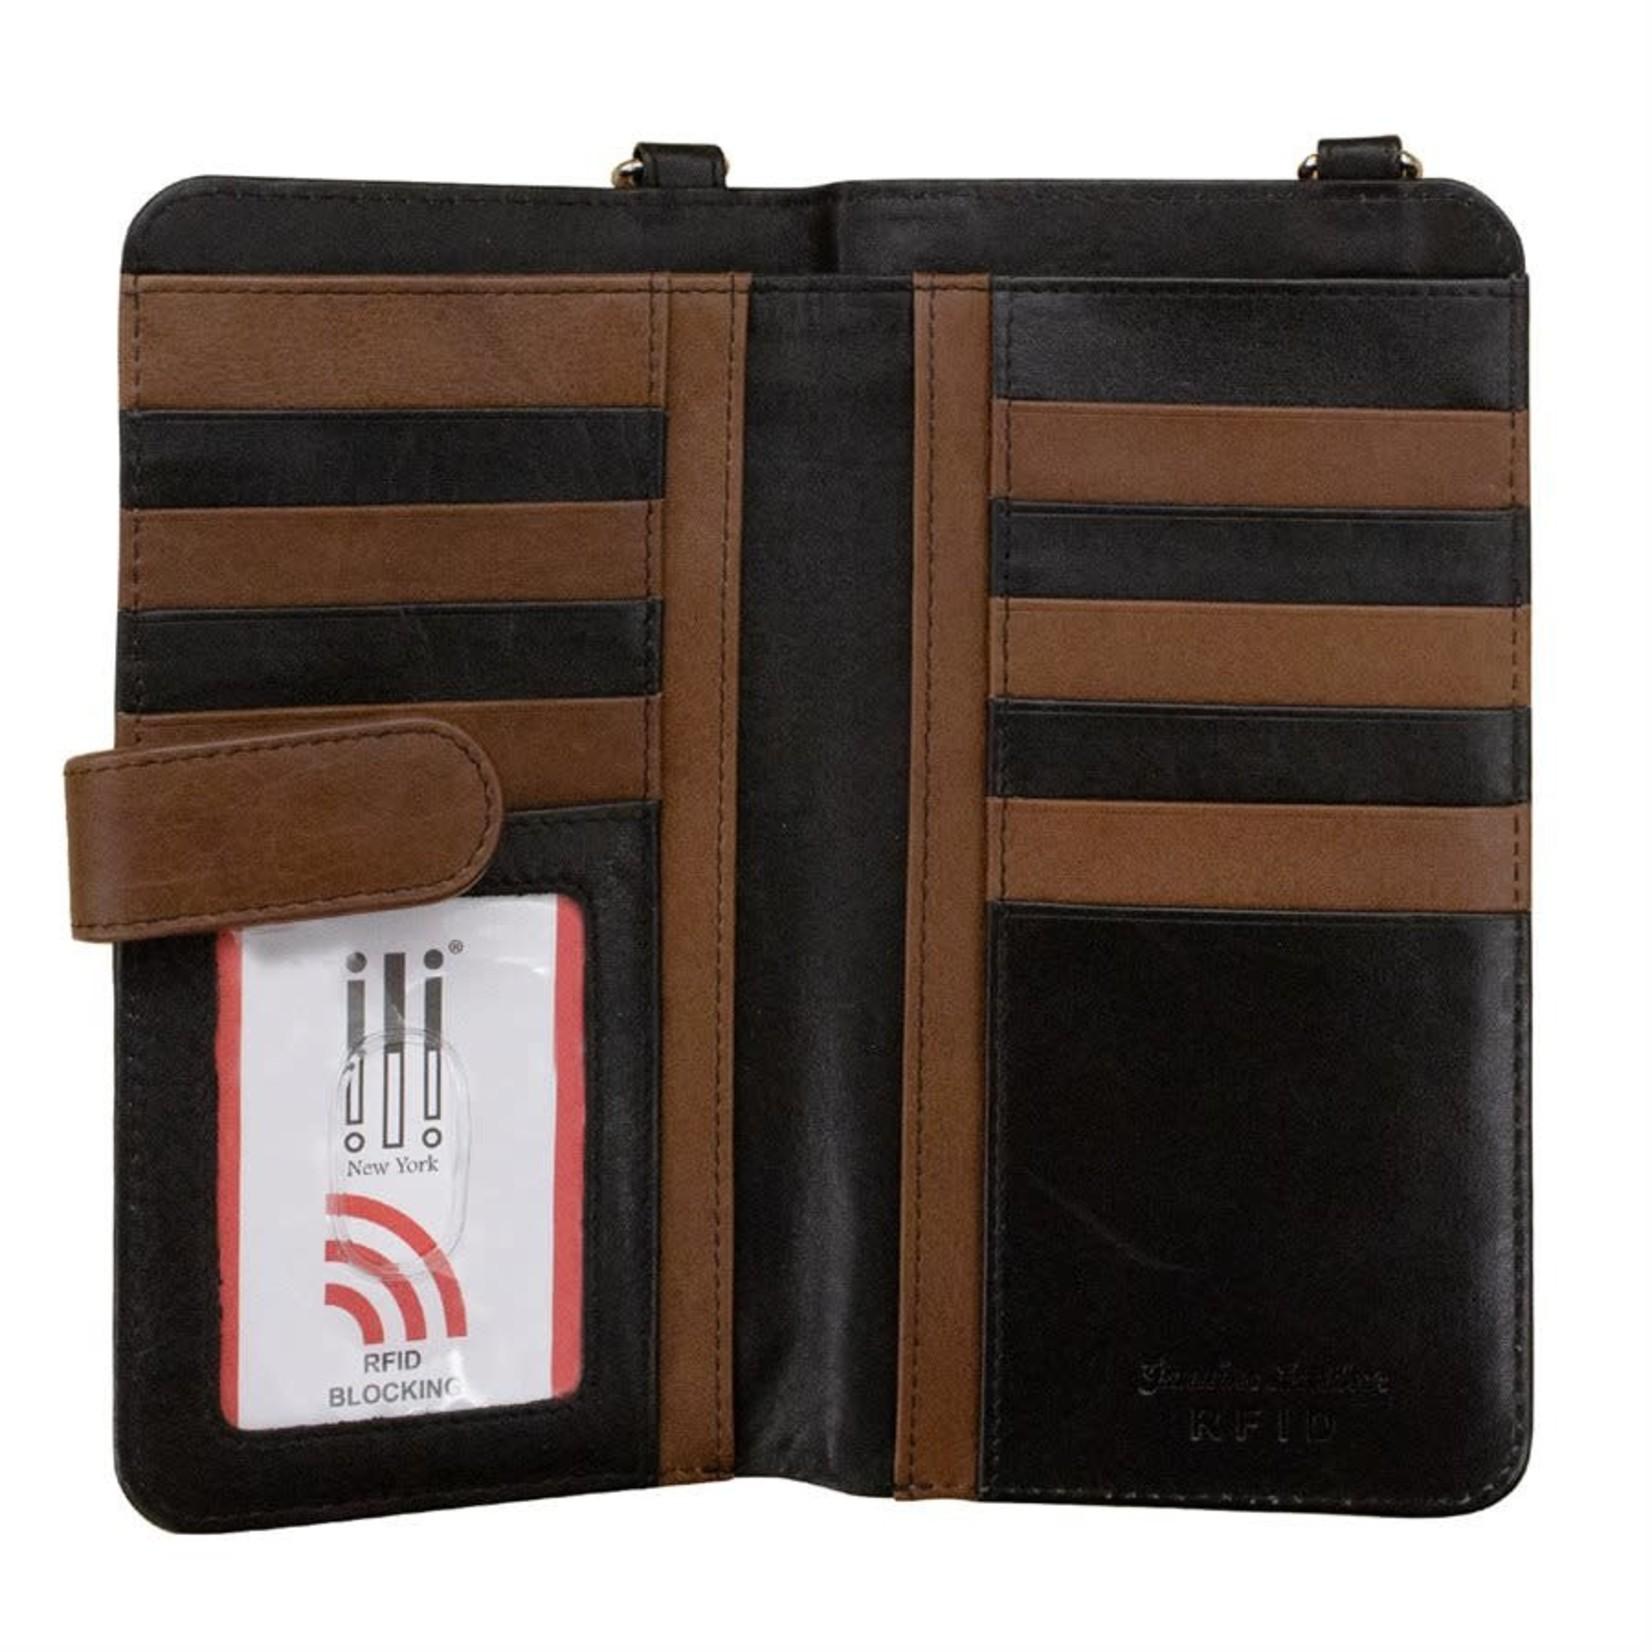 Leather Handbags and Accessories 6363 Toffee/Black - RFID Organizer Crossbody